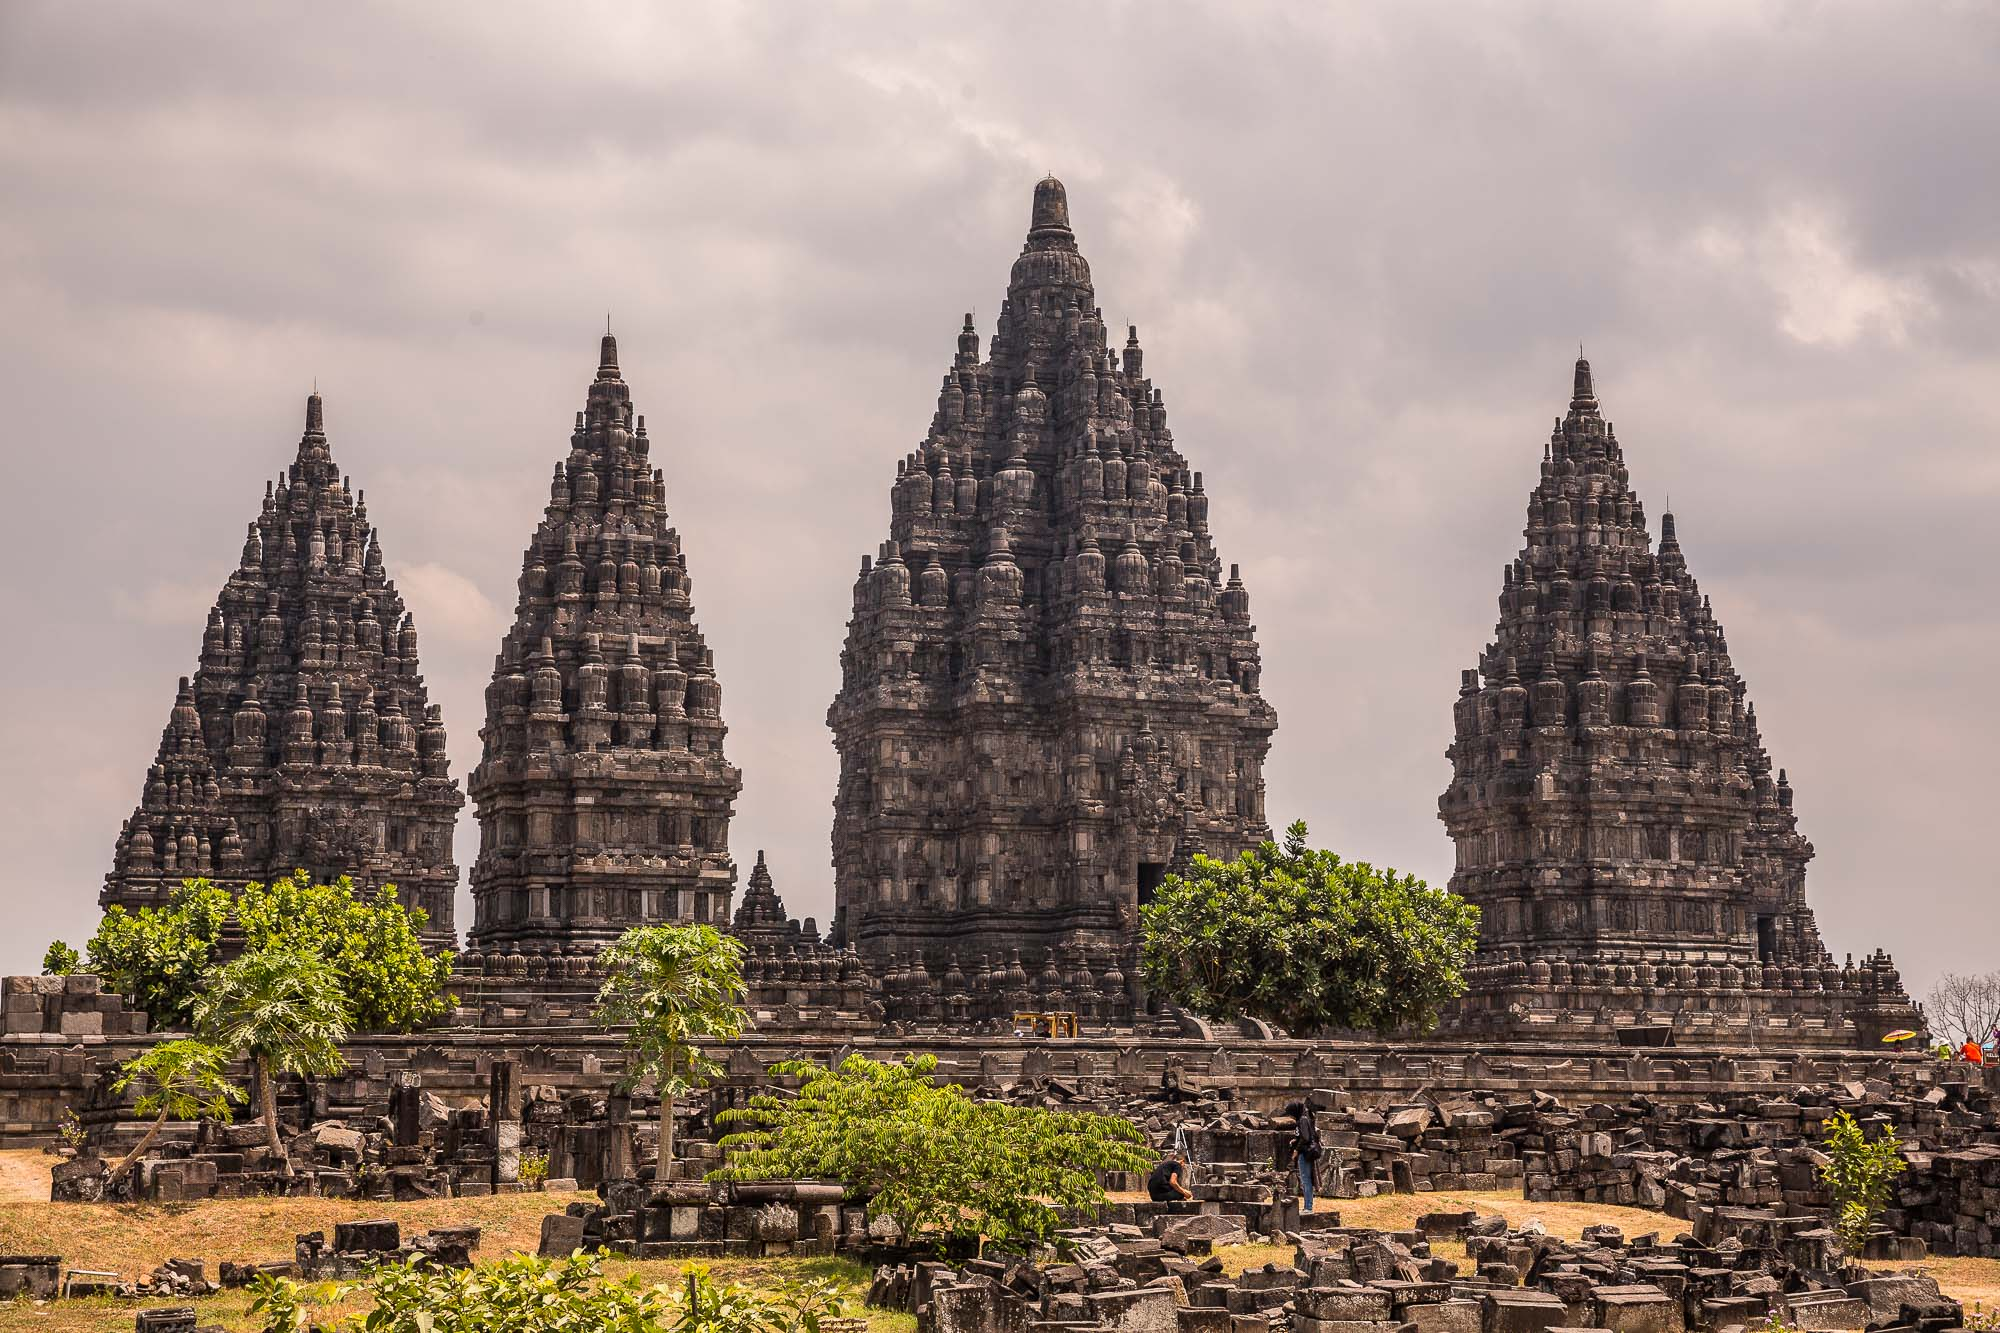 INDONESIA_2015_02 BOROBODUR-PRAMBANAN-YOGYA_JusMedic_227